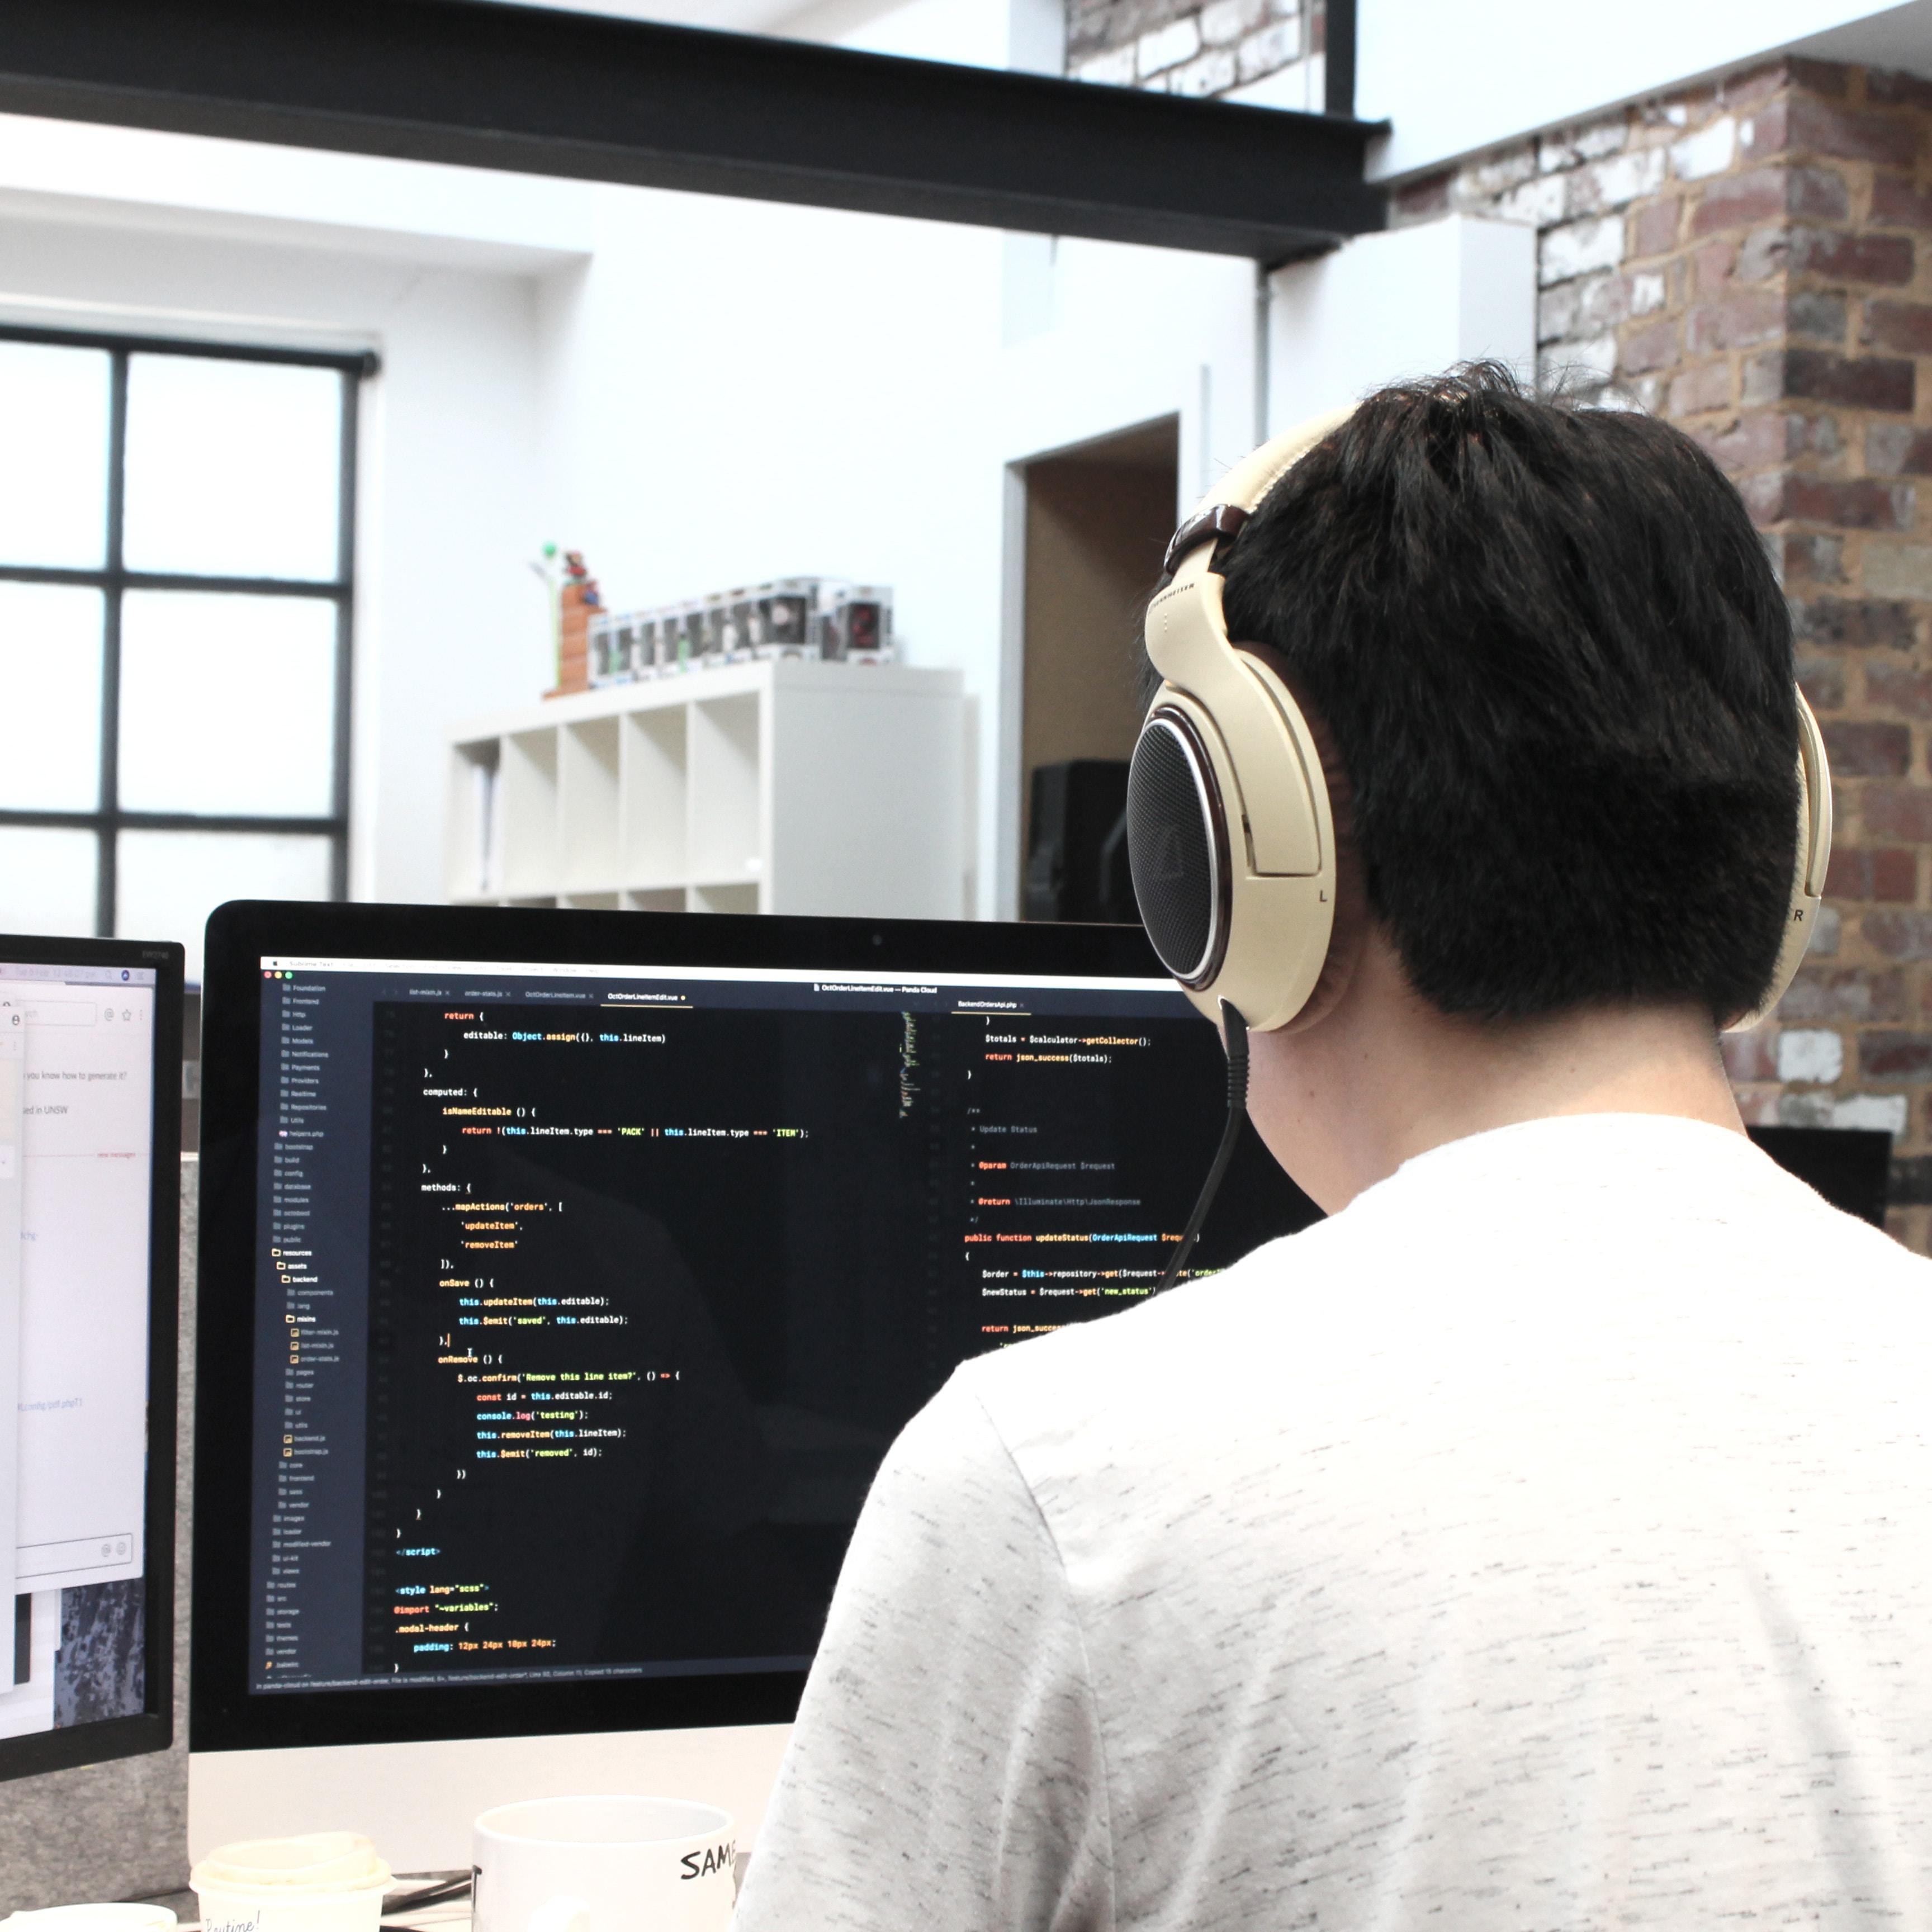 man wearing headphones while using computer